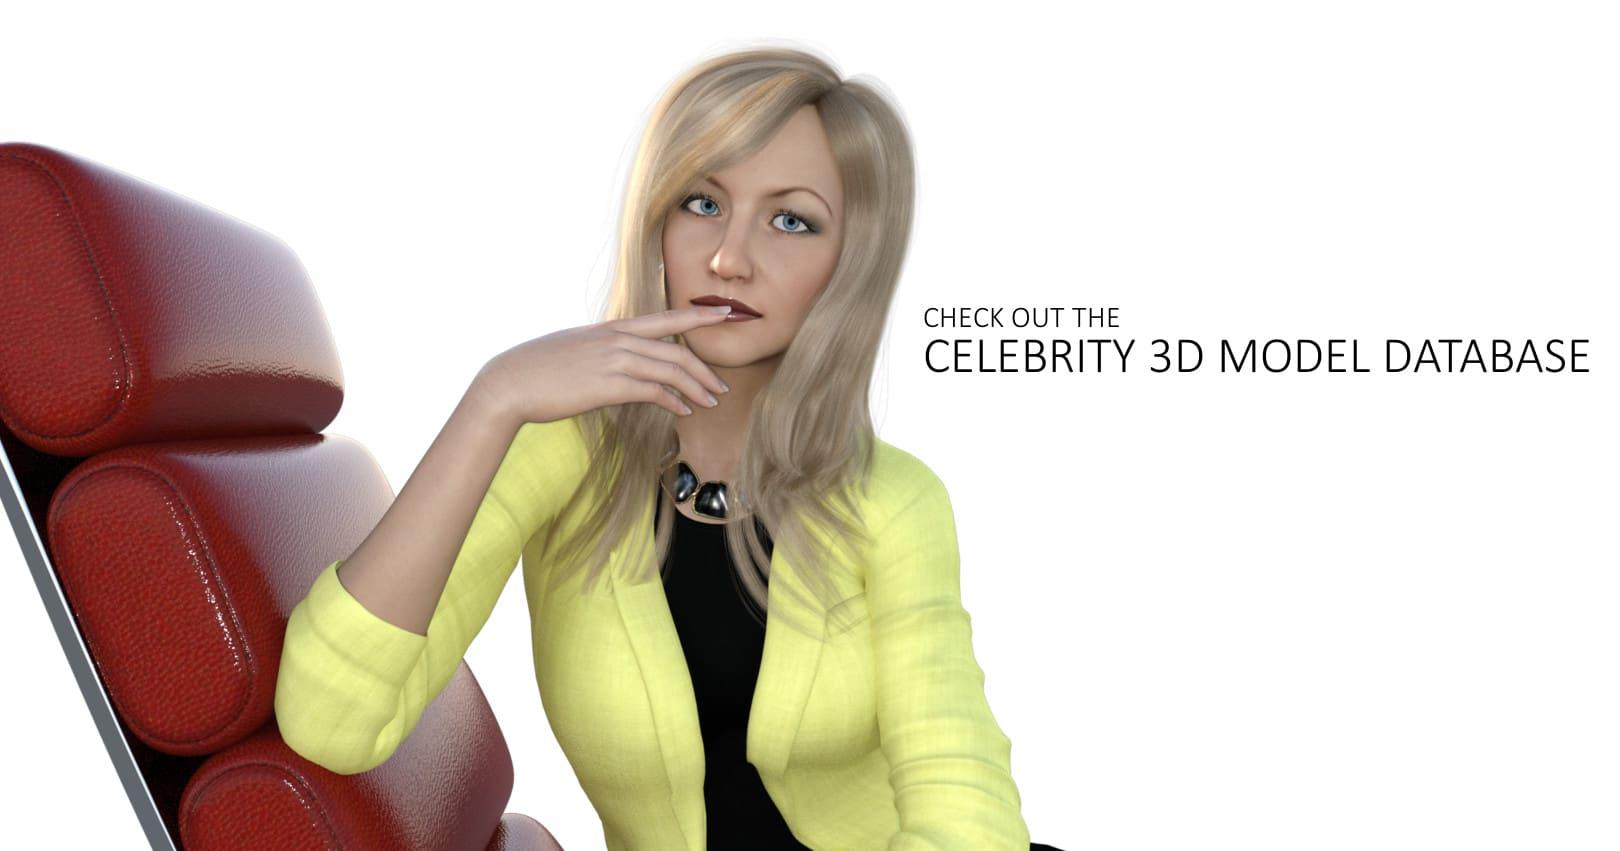 Celebrity 3D Model Database